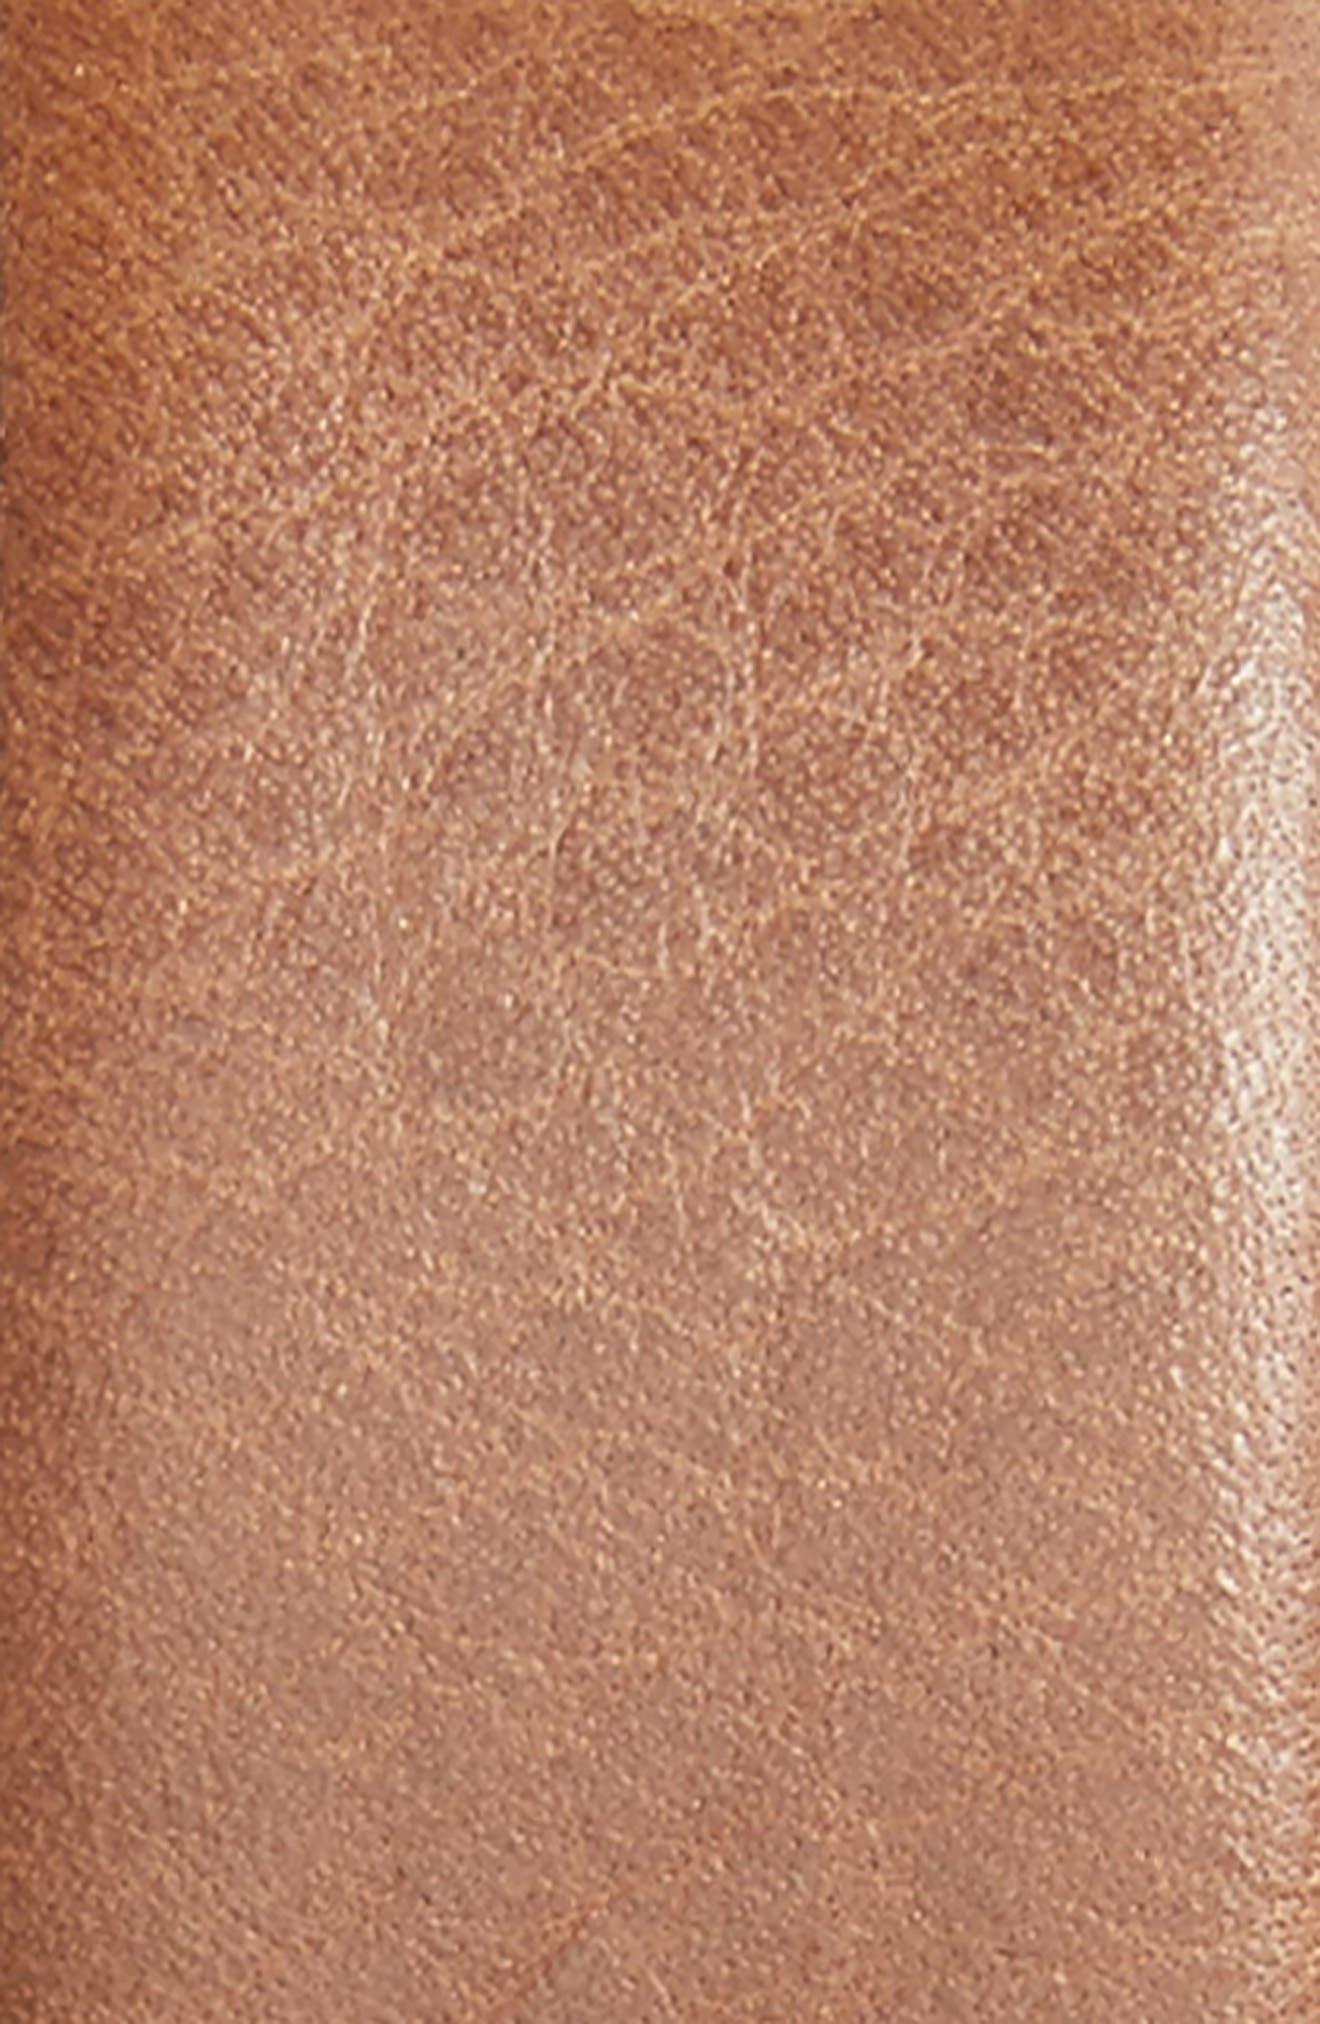 Marlin Leather Belt,                             Alternate thumbnail 2, color,                             210